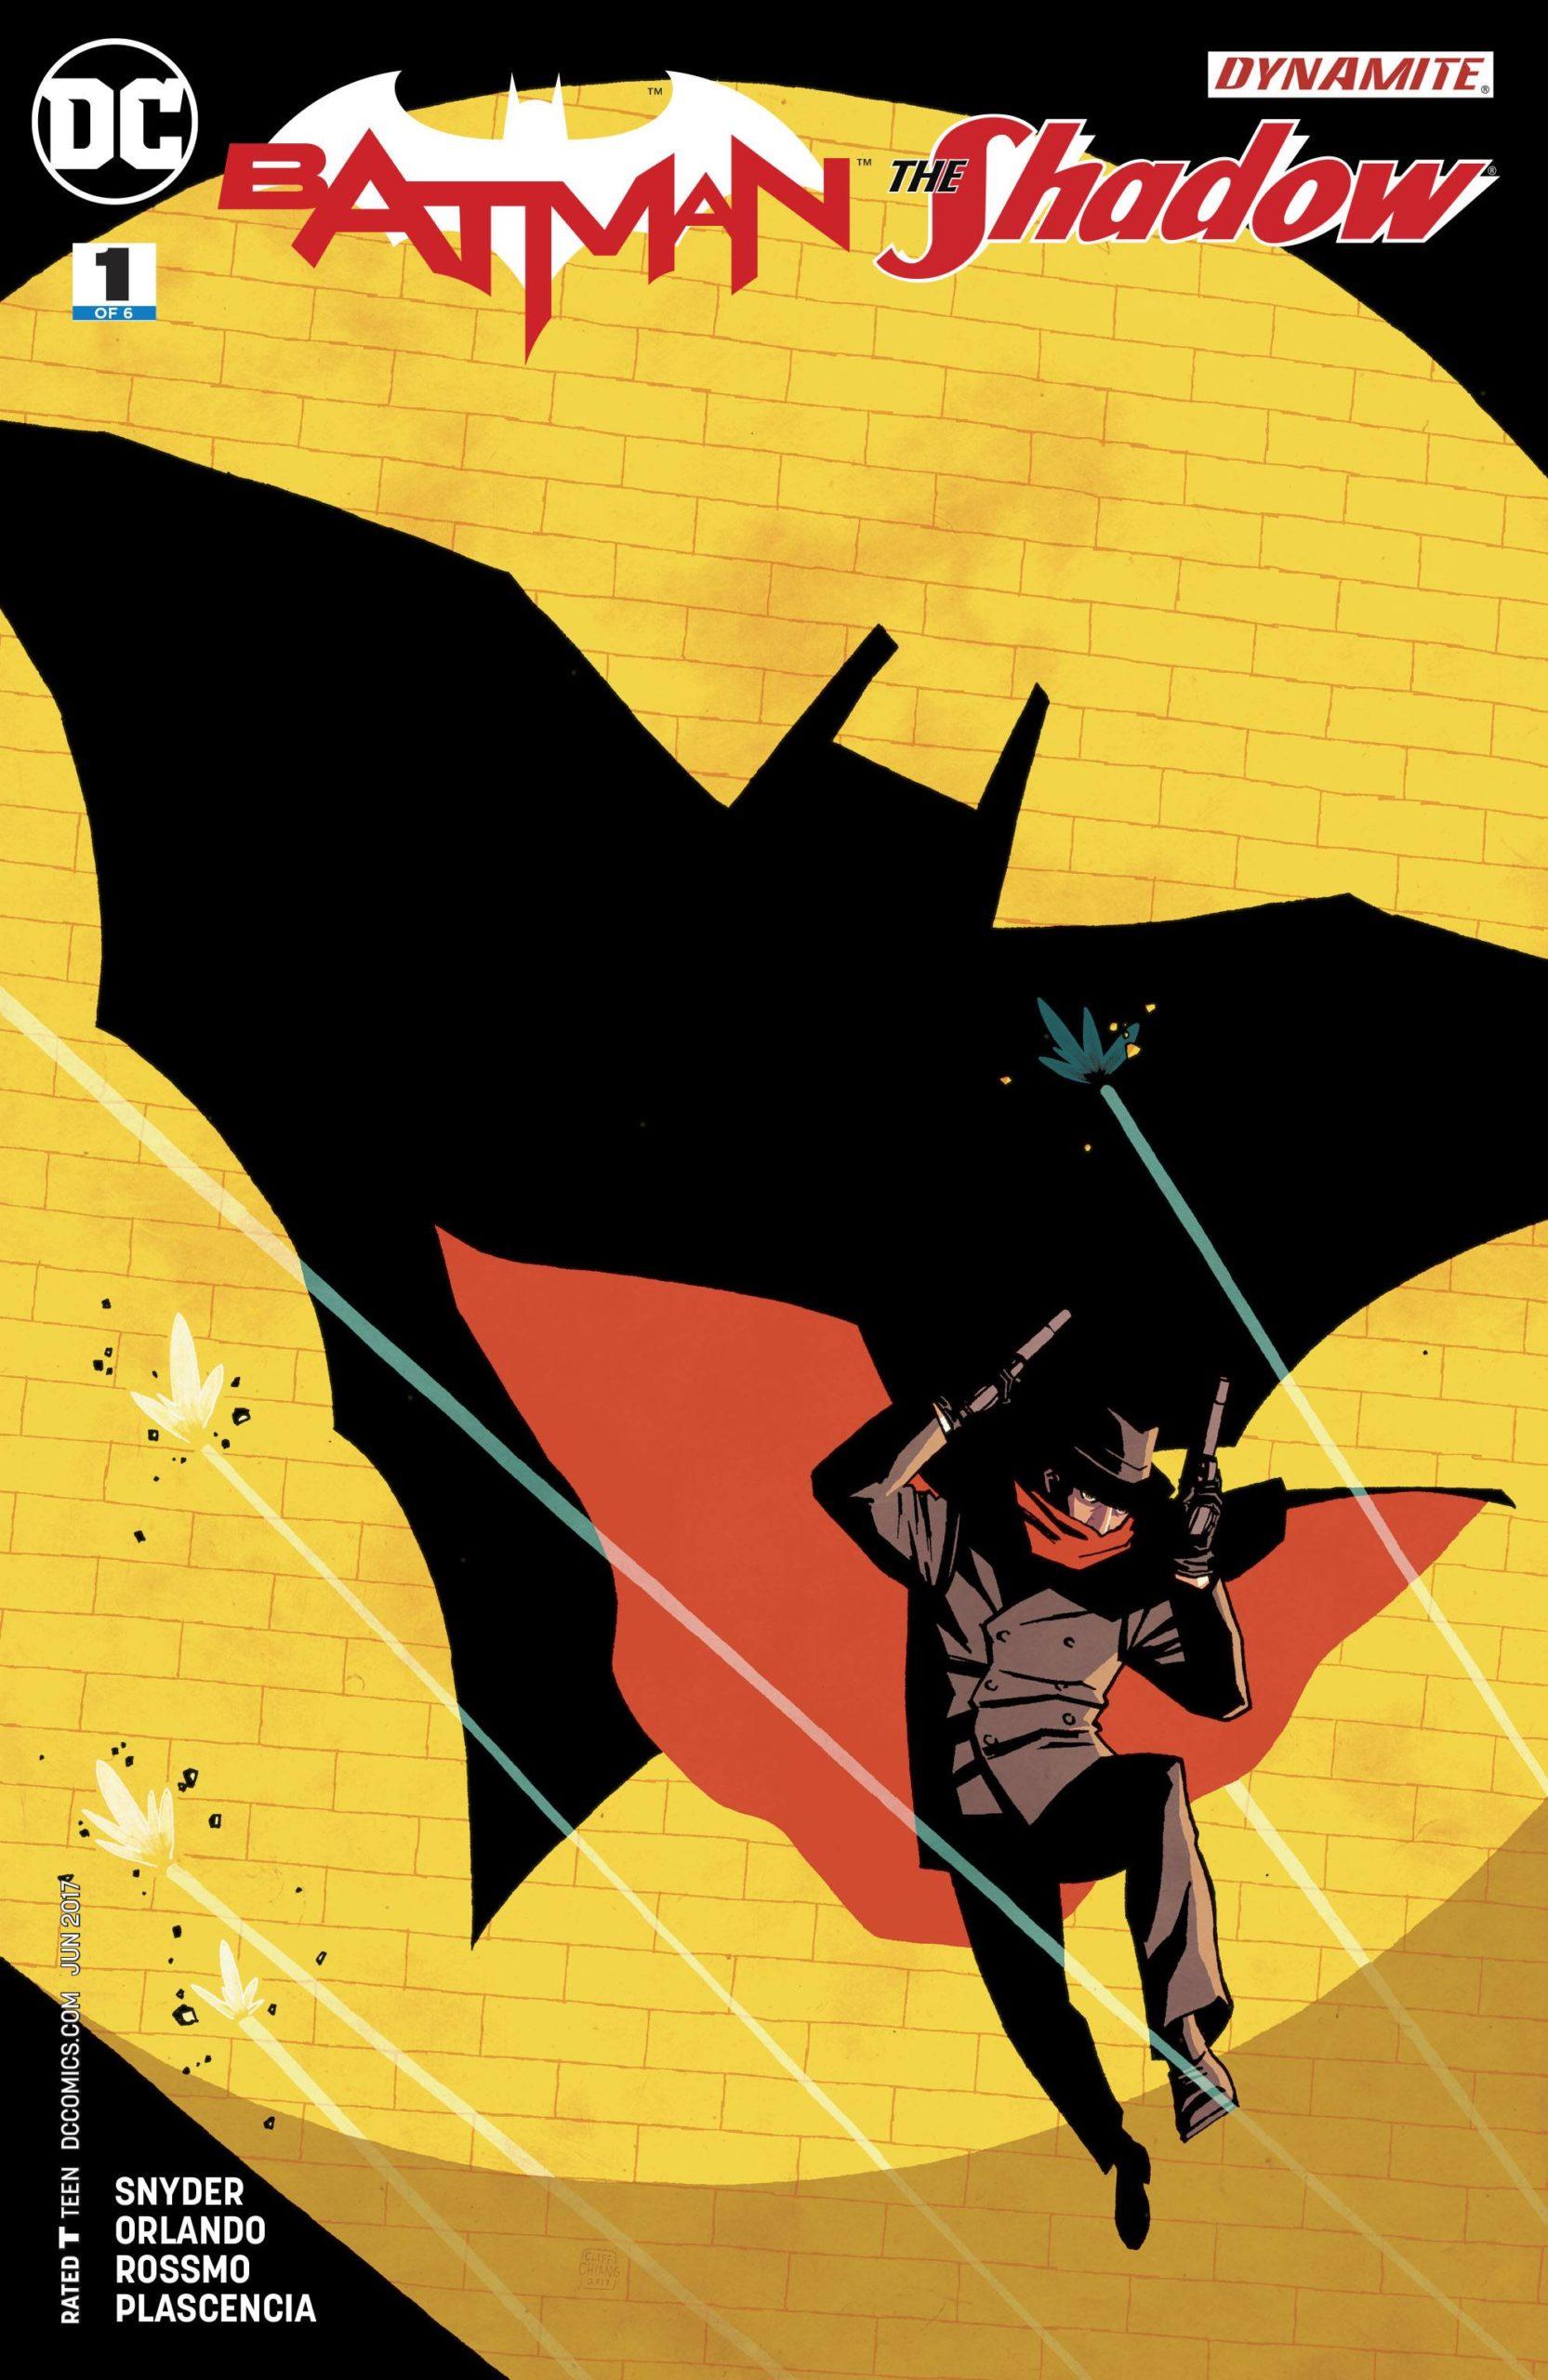 BATMAN THE SHADOW (MS 6)